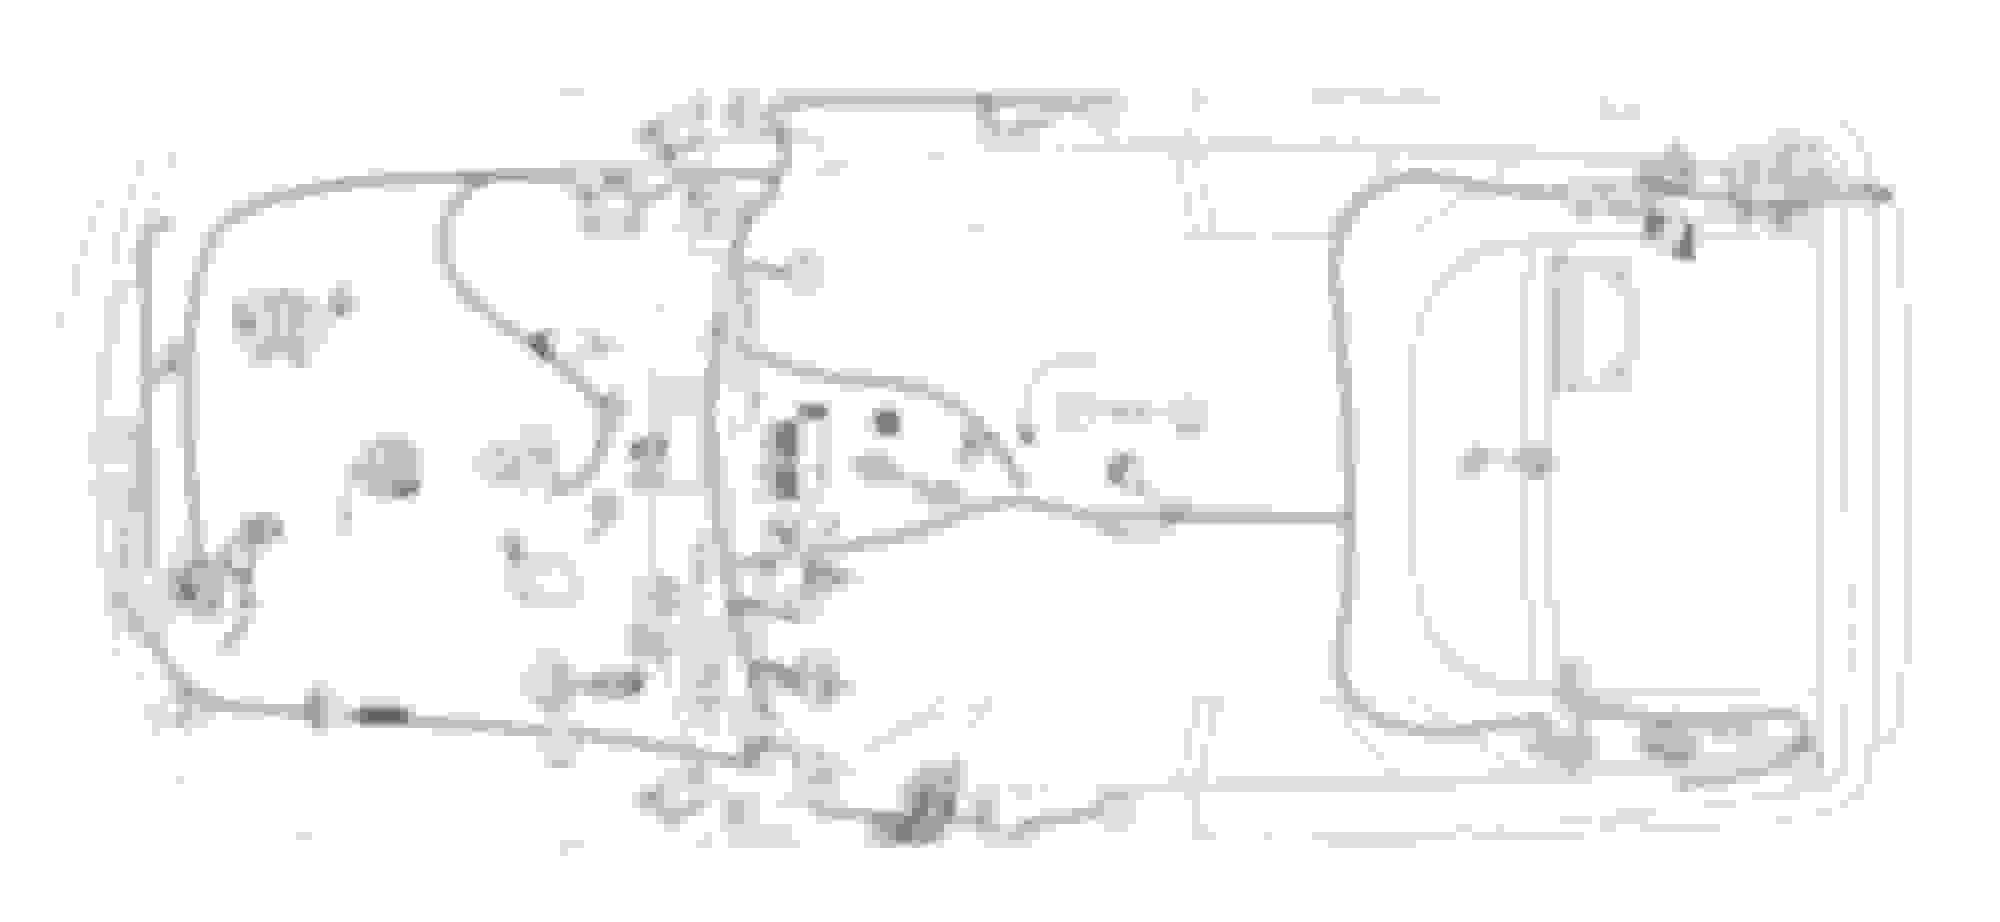 Xjs Engine Wiring - Wiring Diagrams on